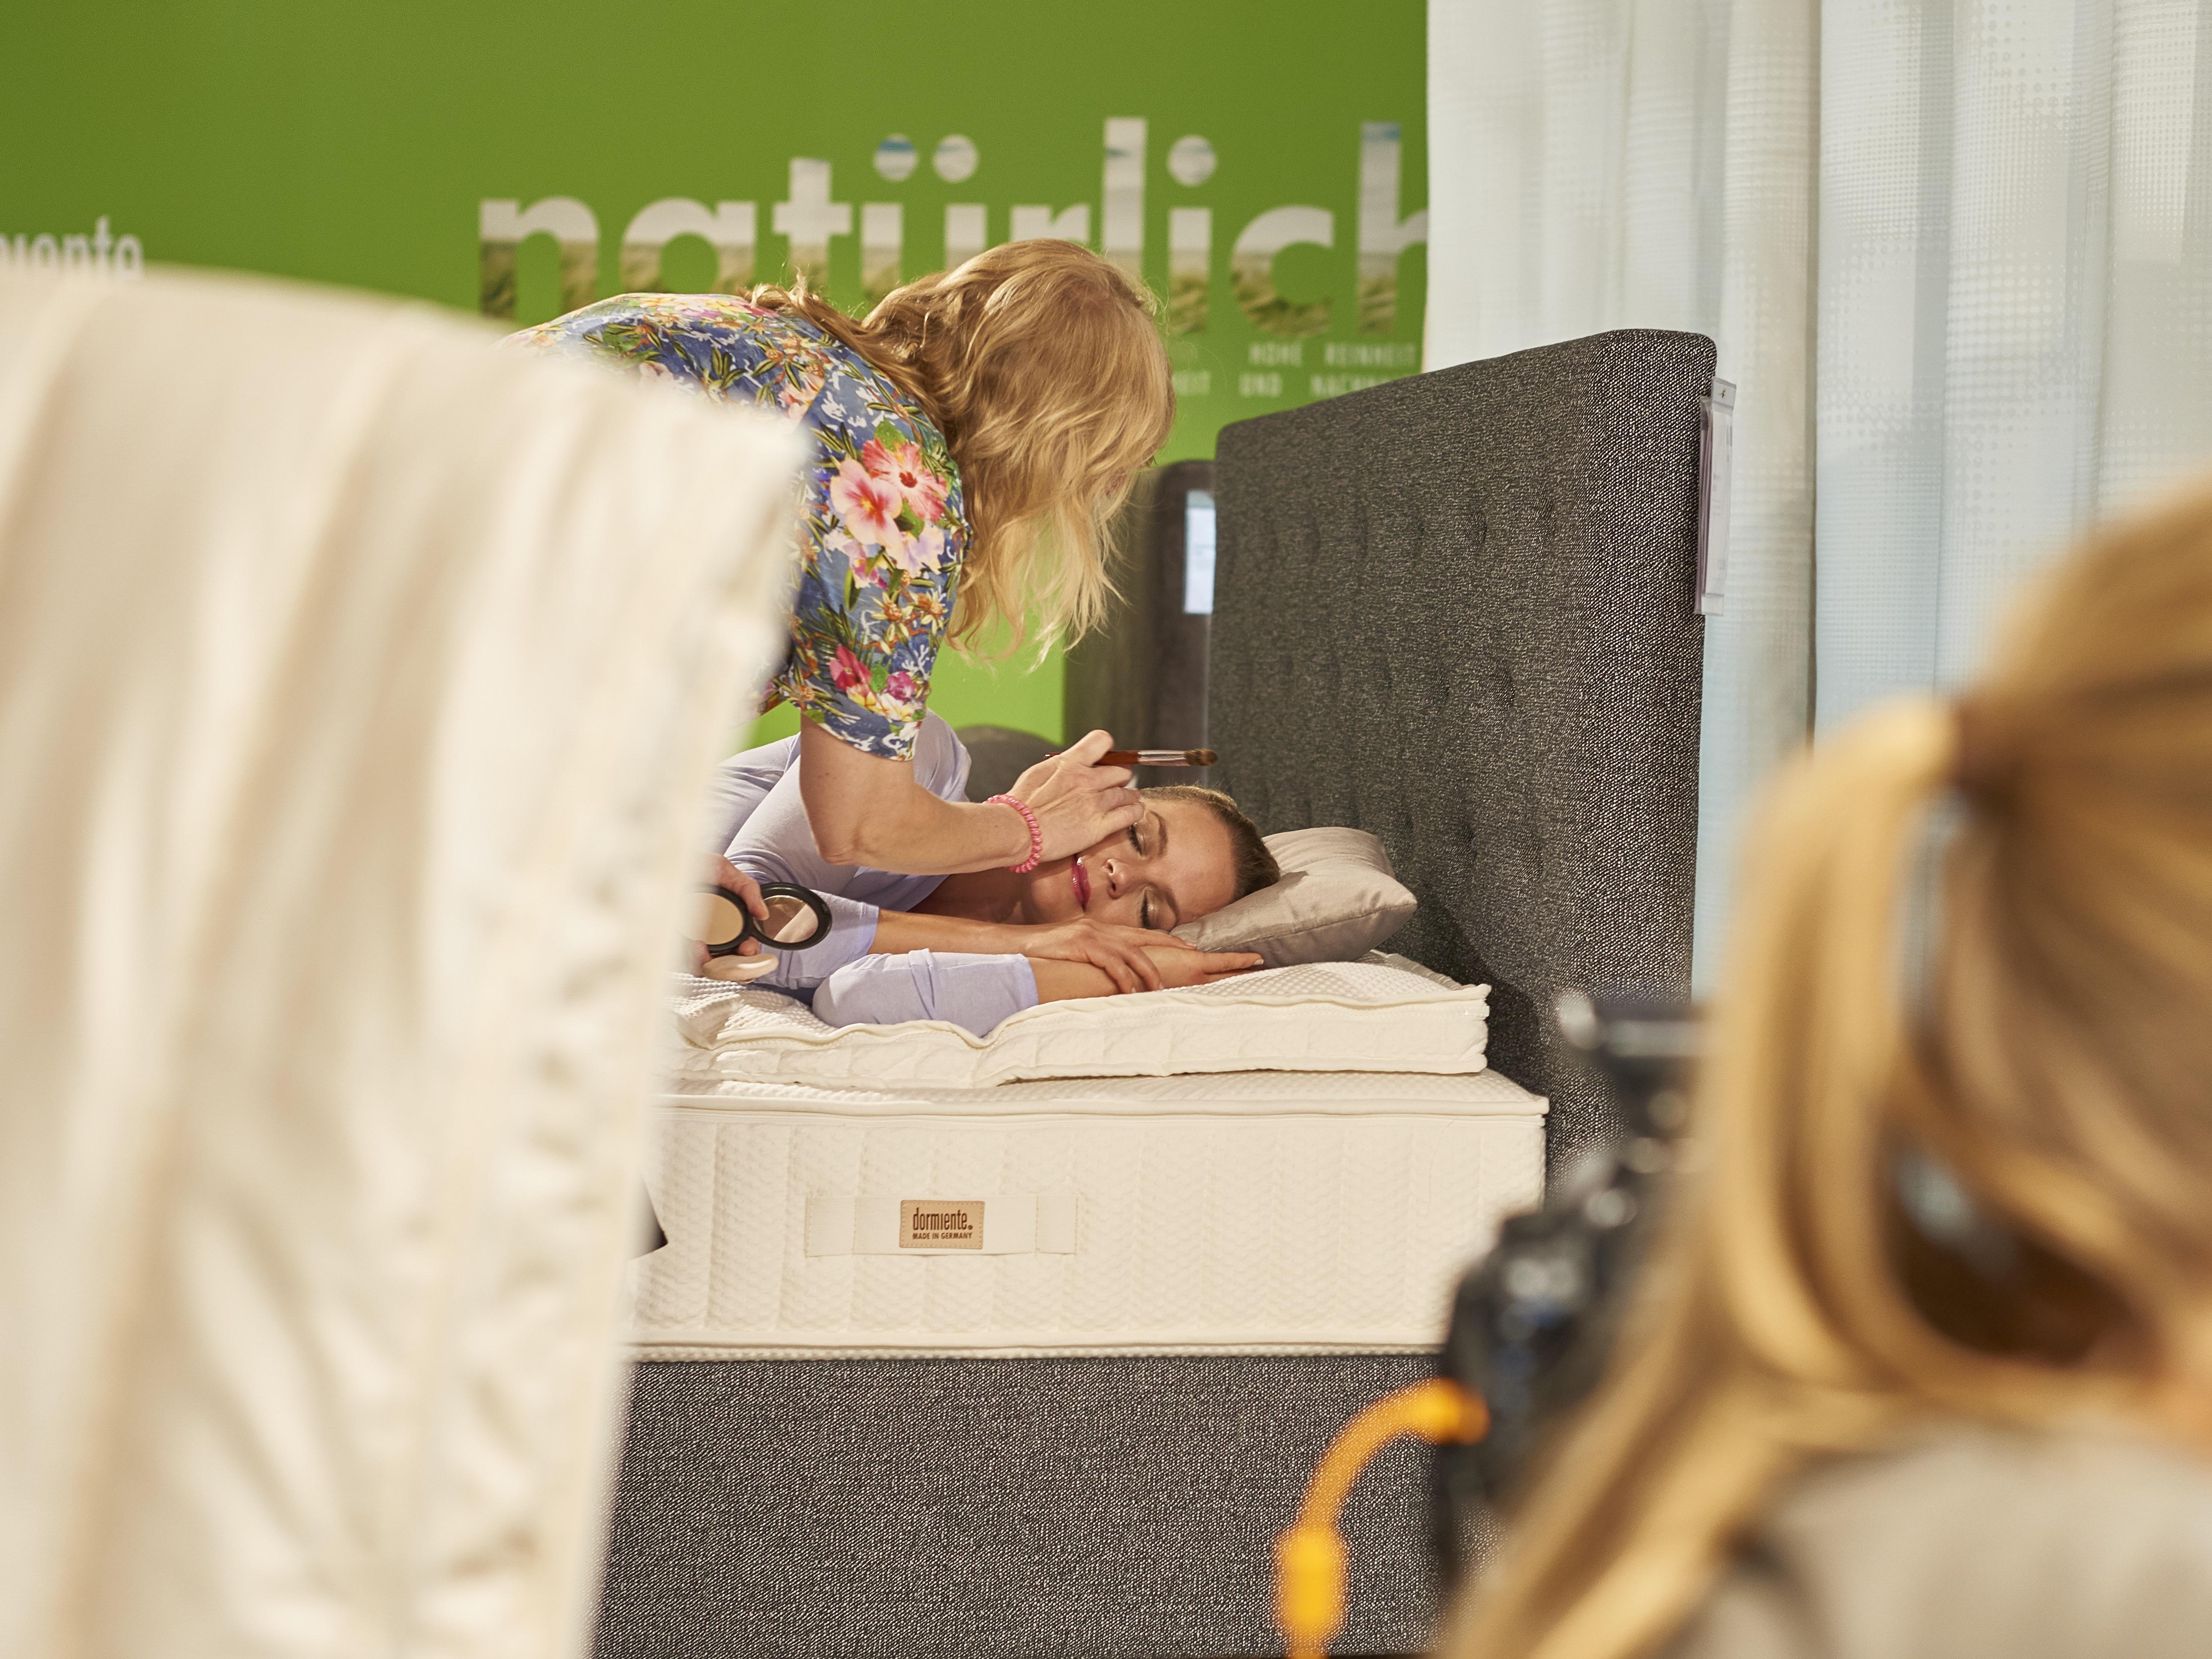 68398361ab8544 Möbel Hesse mit Eva Brenner (Zuhause im Glück) › Janine Koehler Make-up  Artist Hannover